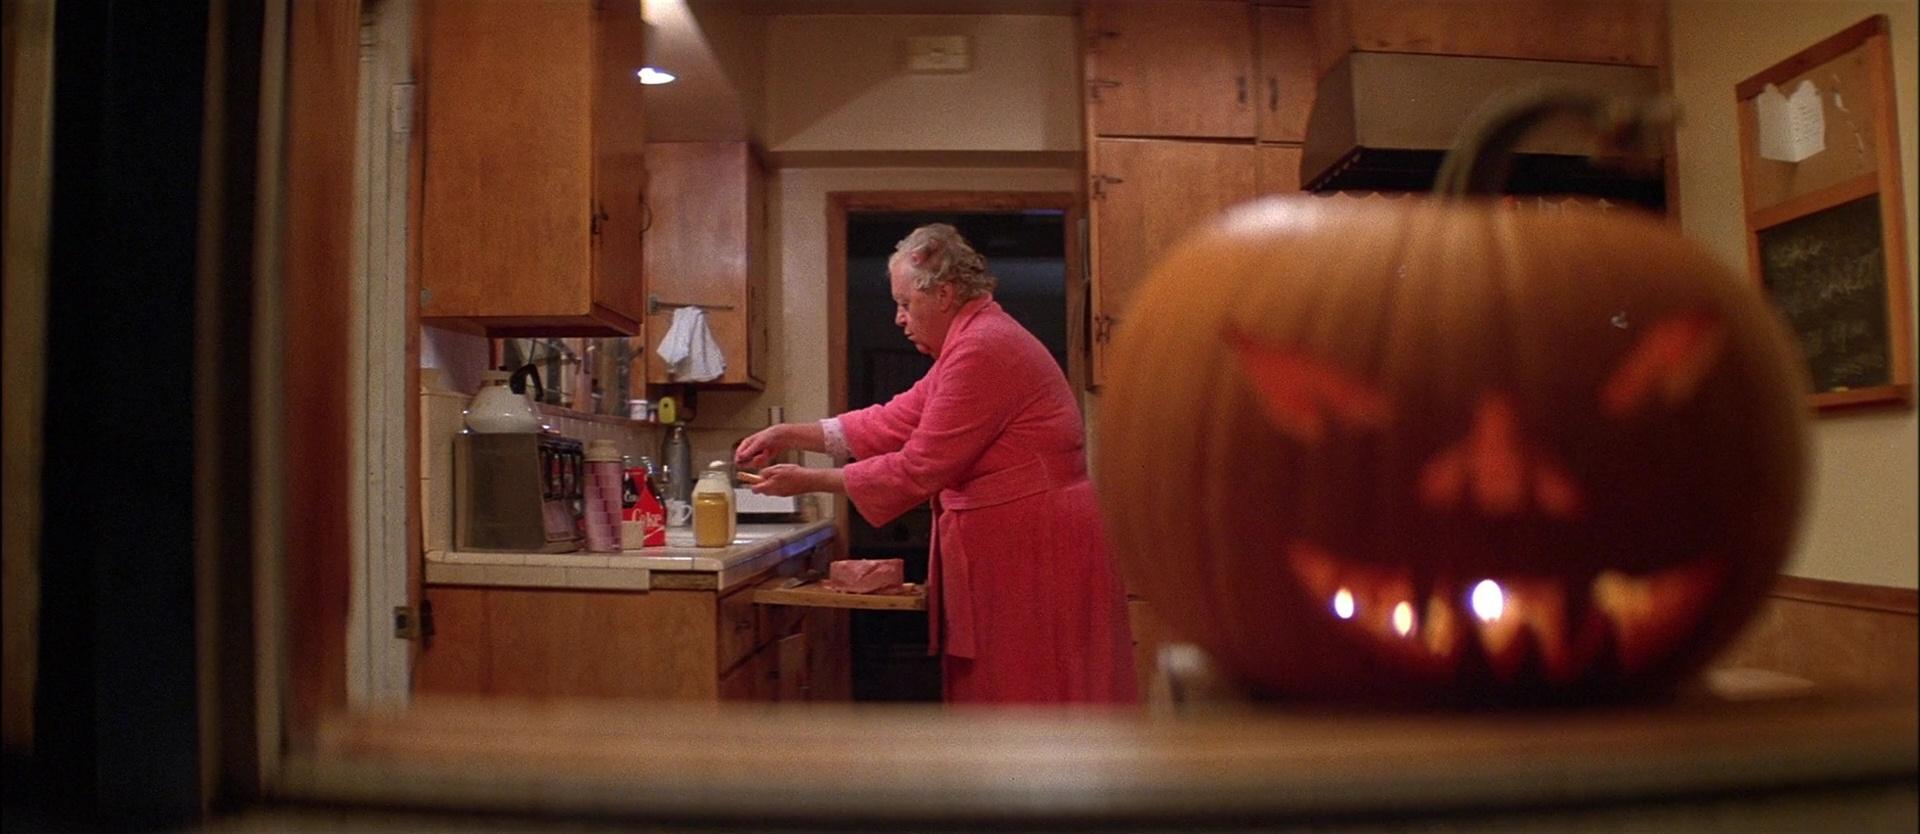 Halloween II film still 1